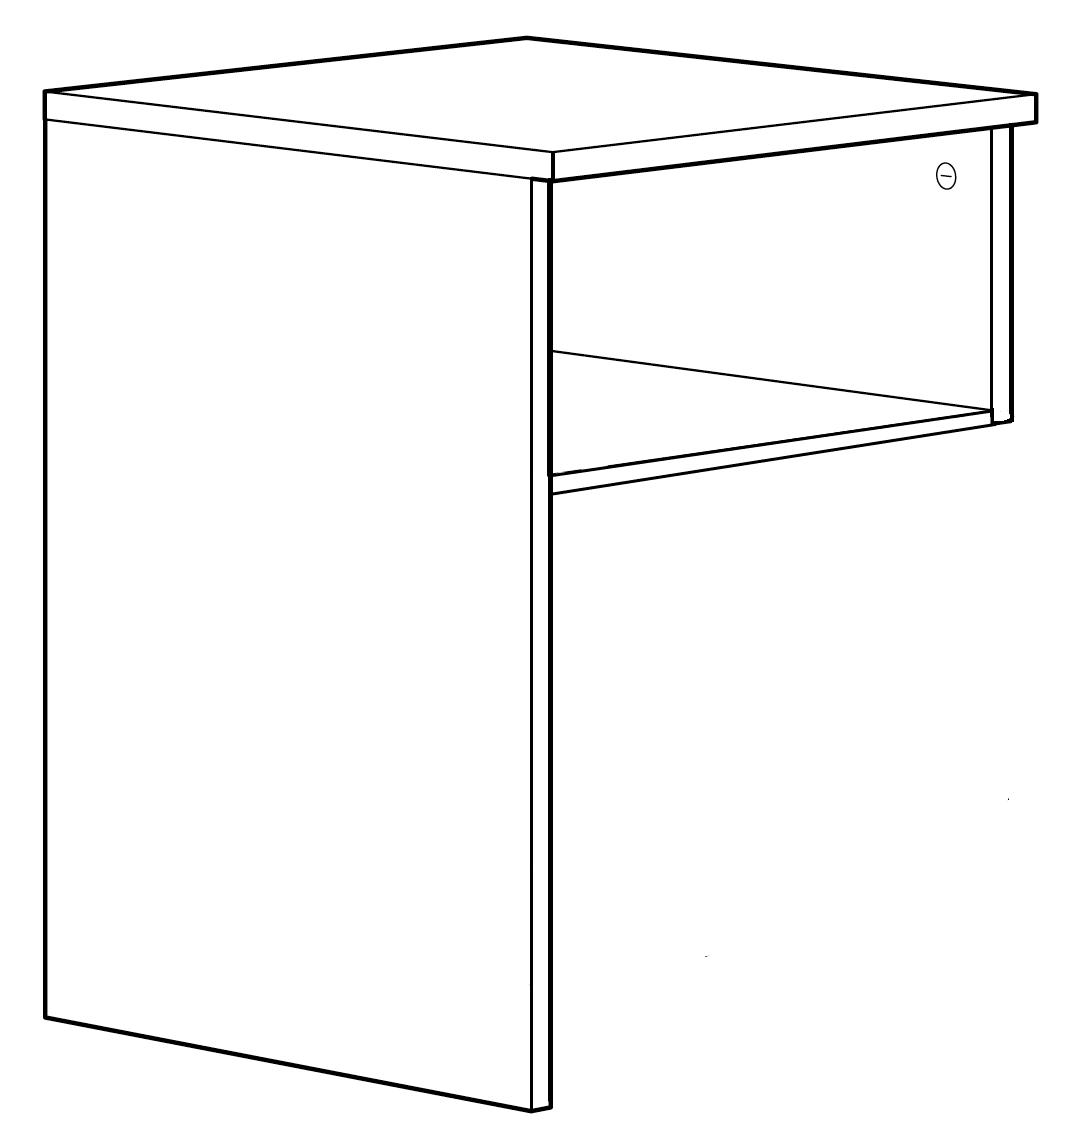 BRIMNES bedside table: Perfected for the BRIMNES storage bed